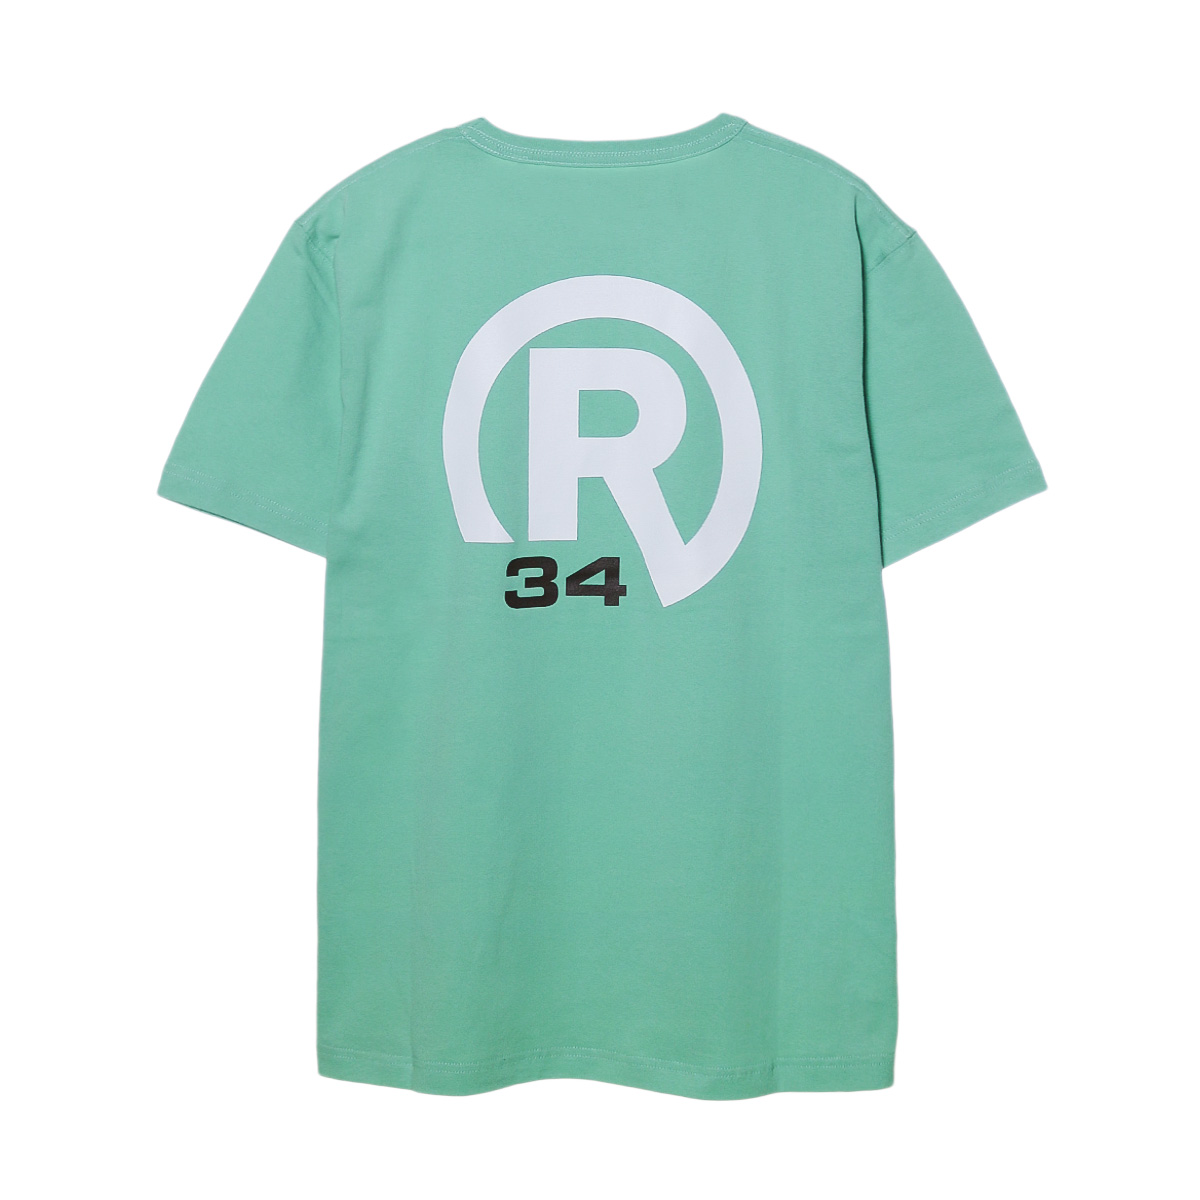 HEAVY WEIGHT BASIC R34 T-SHIRT